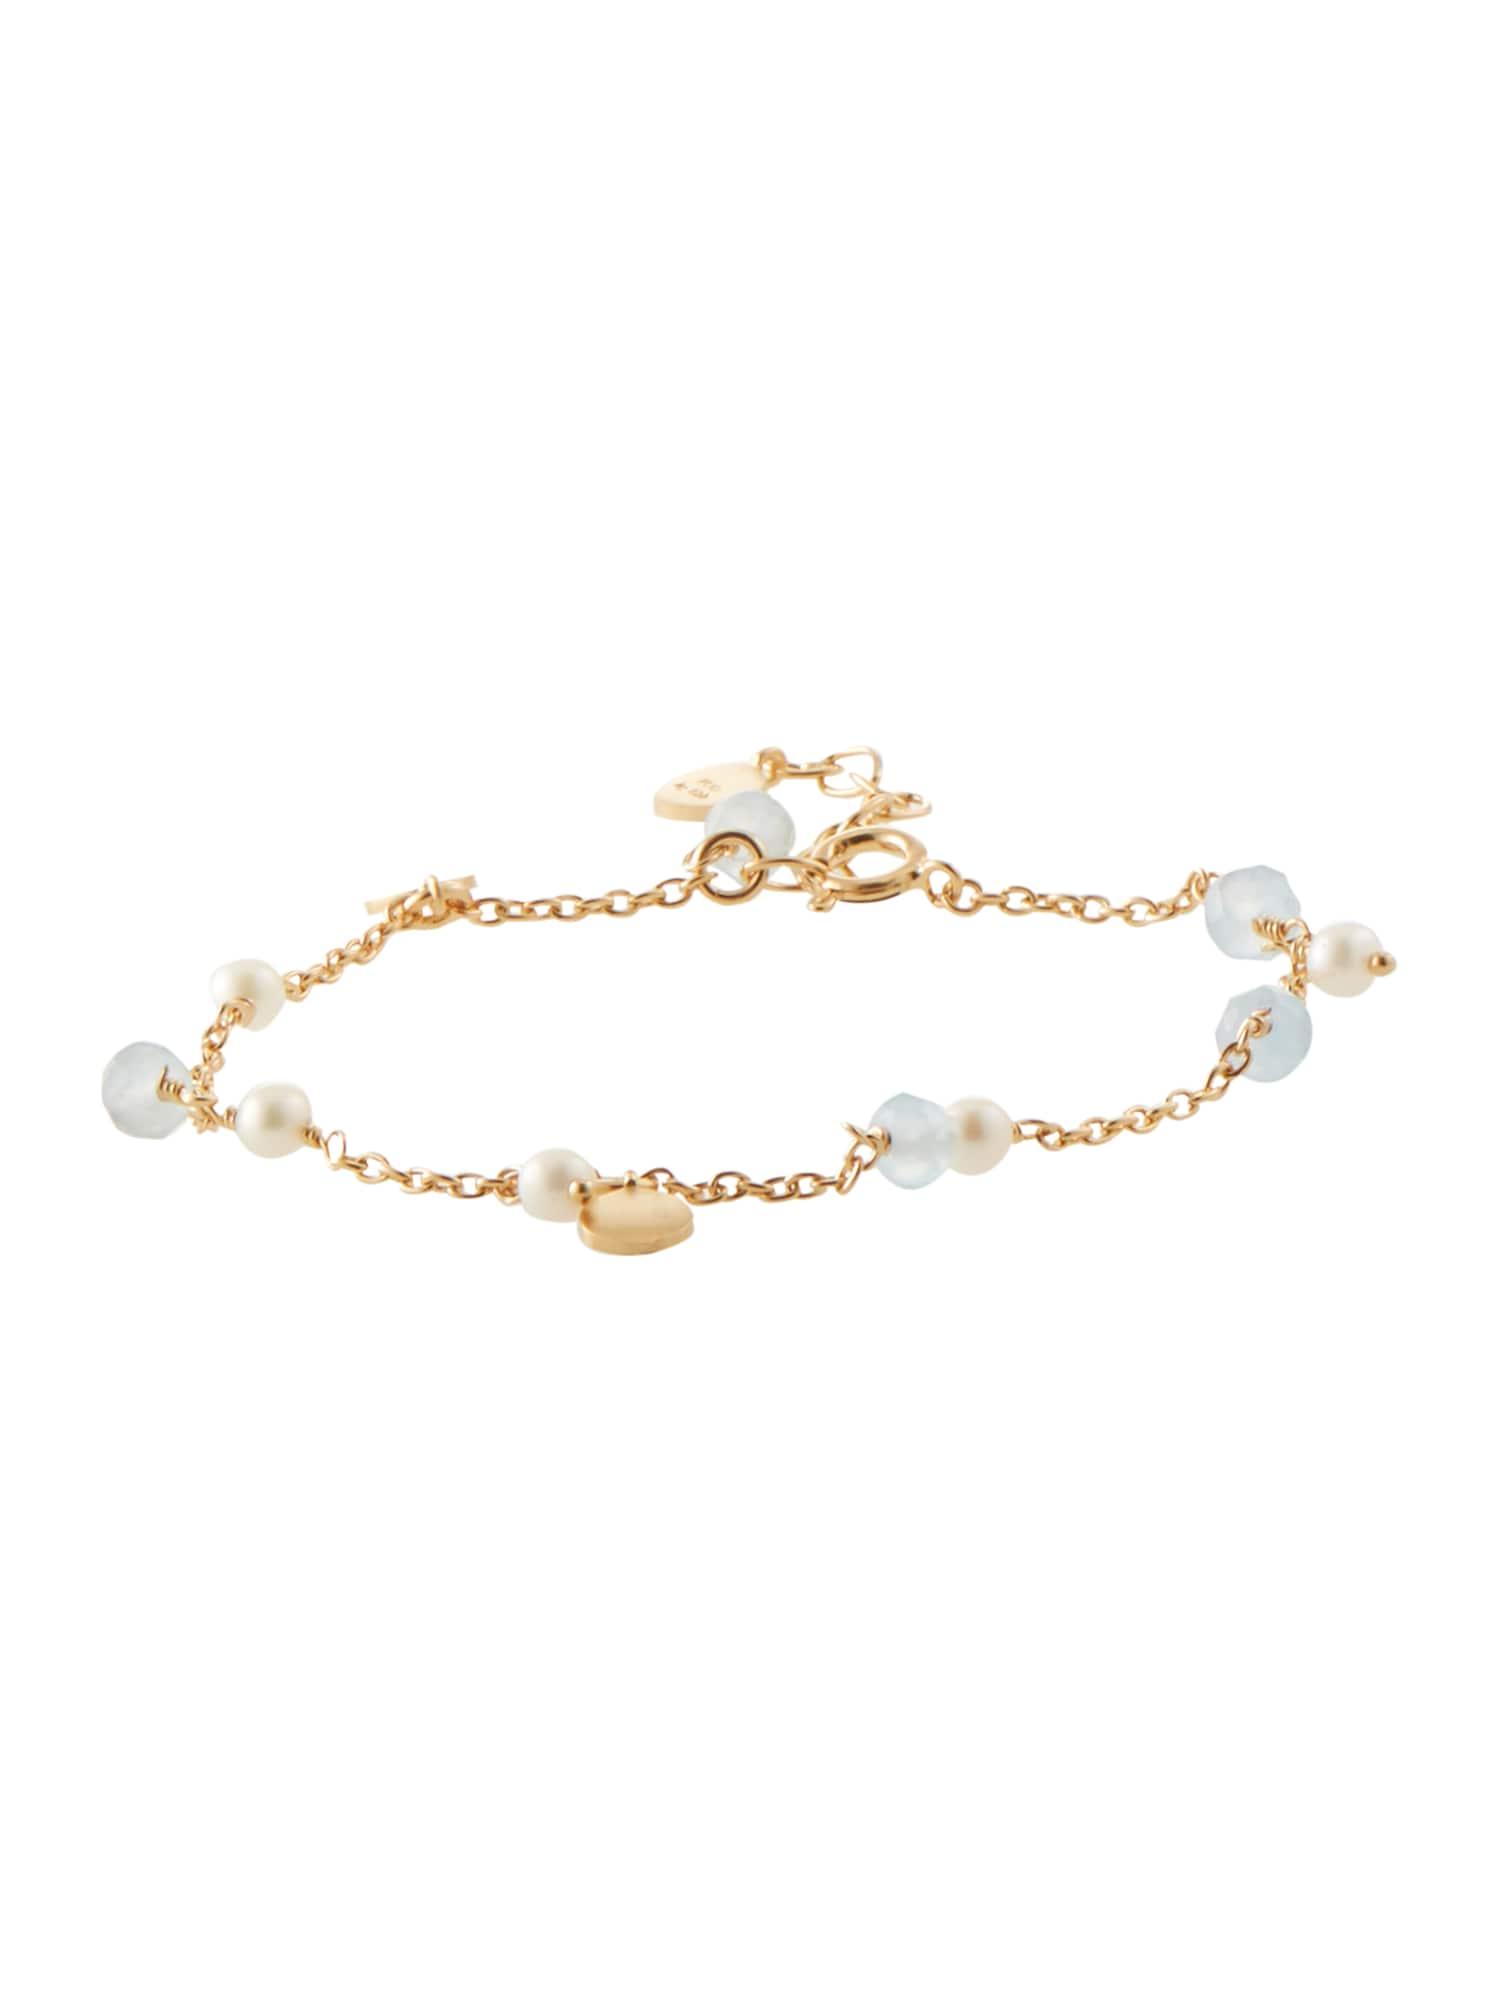 Pernille Corydon Jewellery Apyrankė